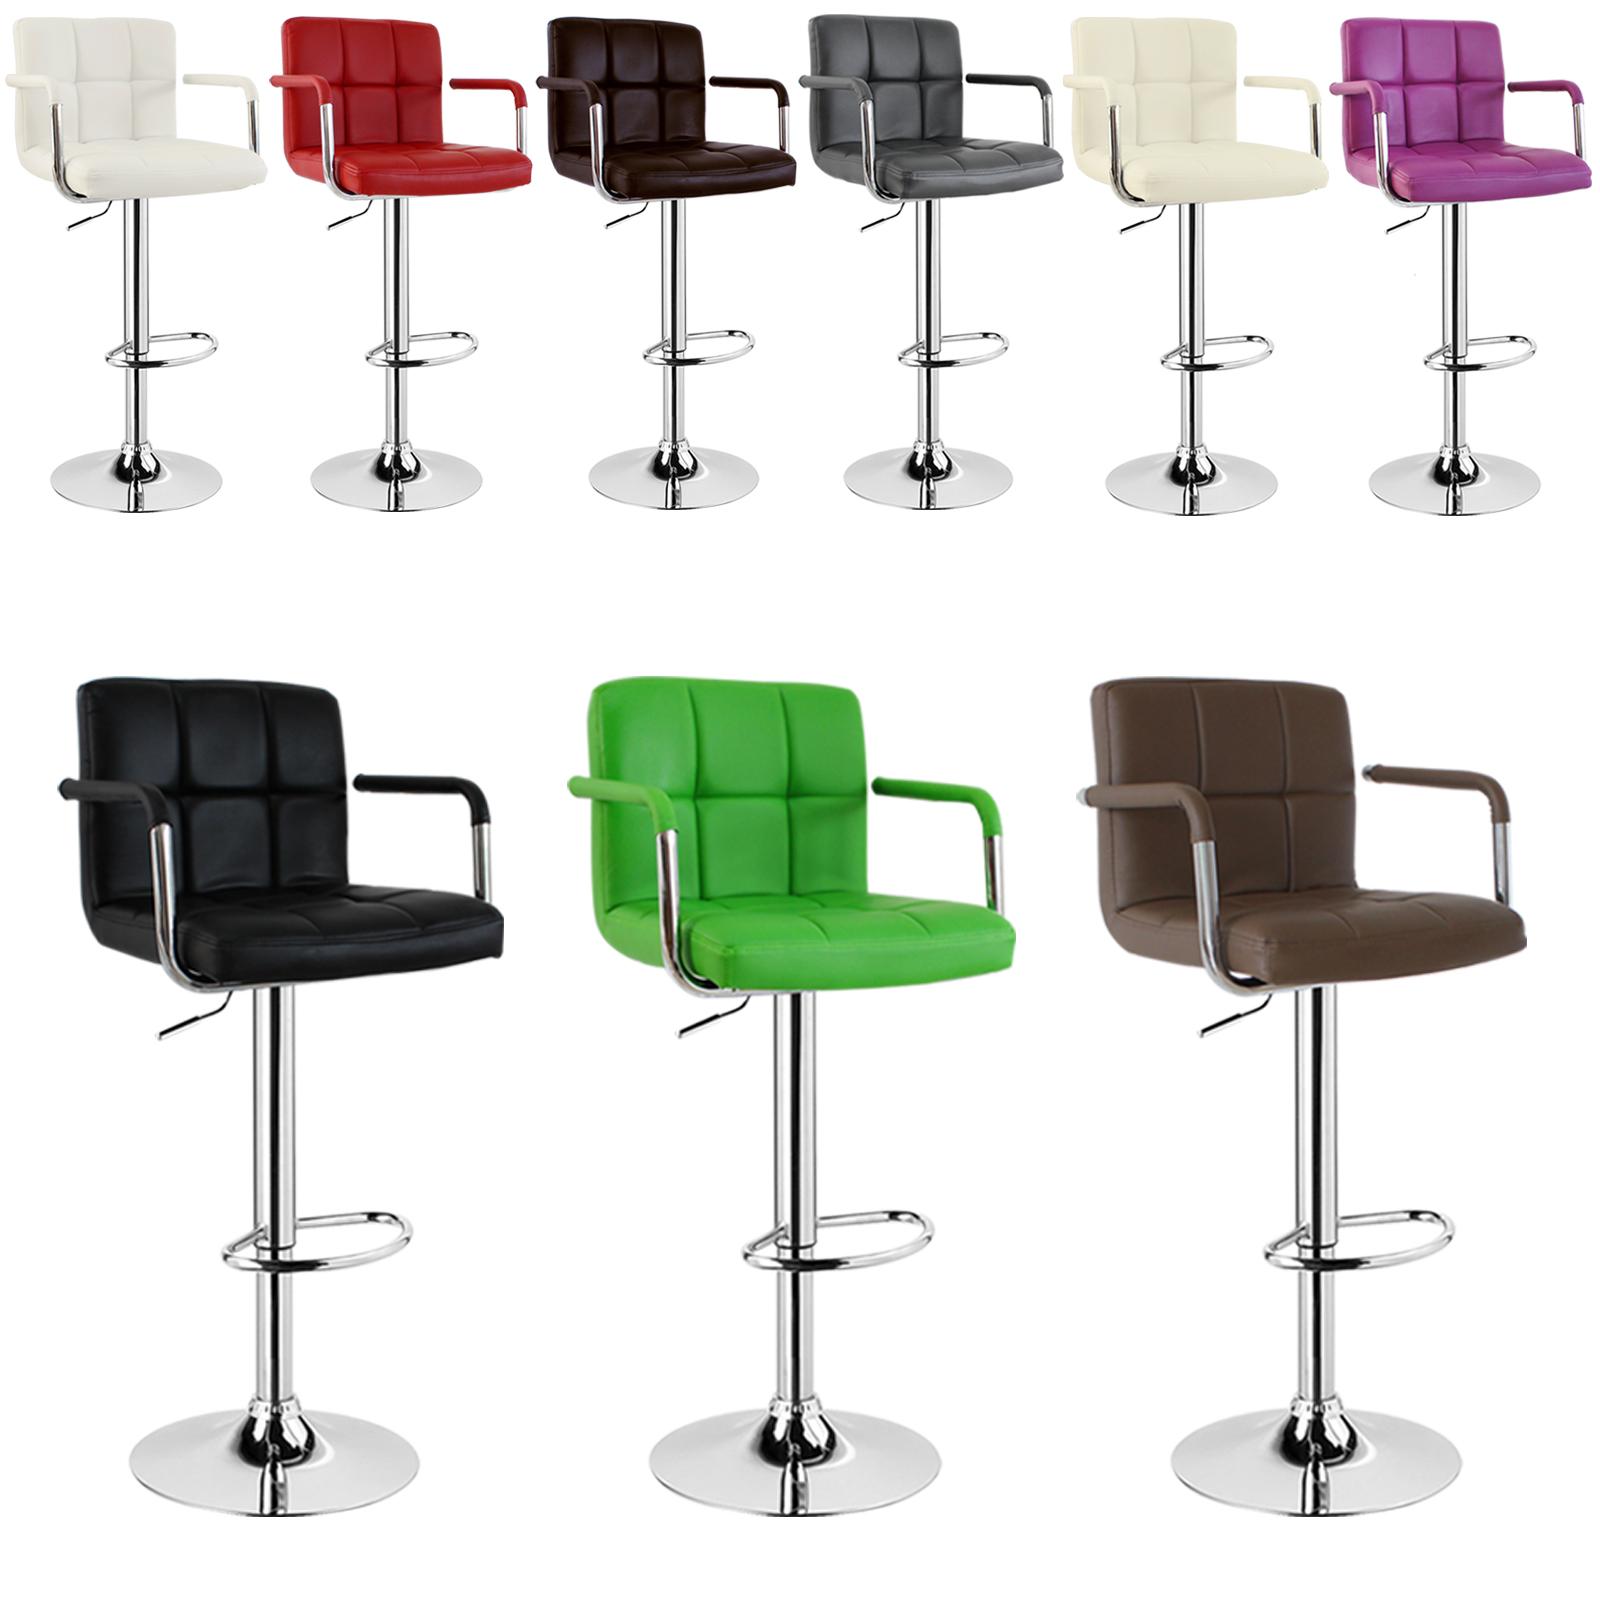 tabouret de bar comptoir similicuir salon tournant 1pcs 502 24 ebay. Black Bedroom Furniture Sets. Home Design Ideas